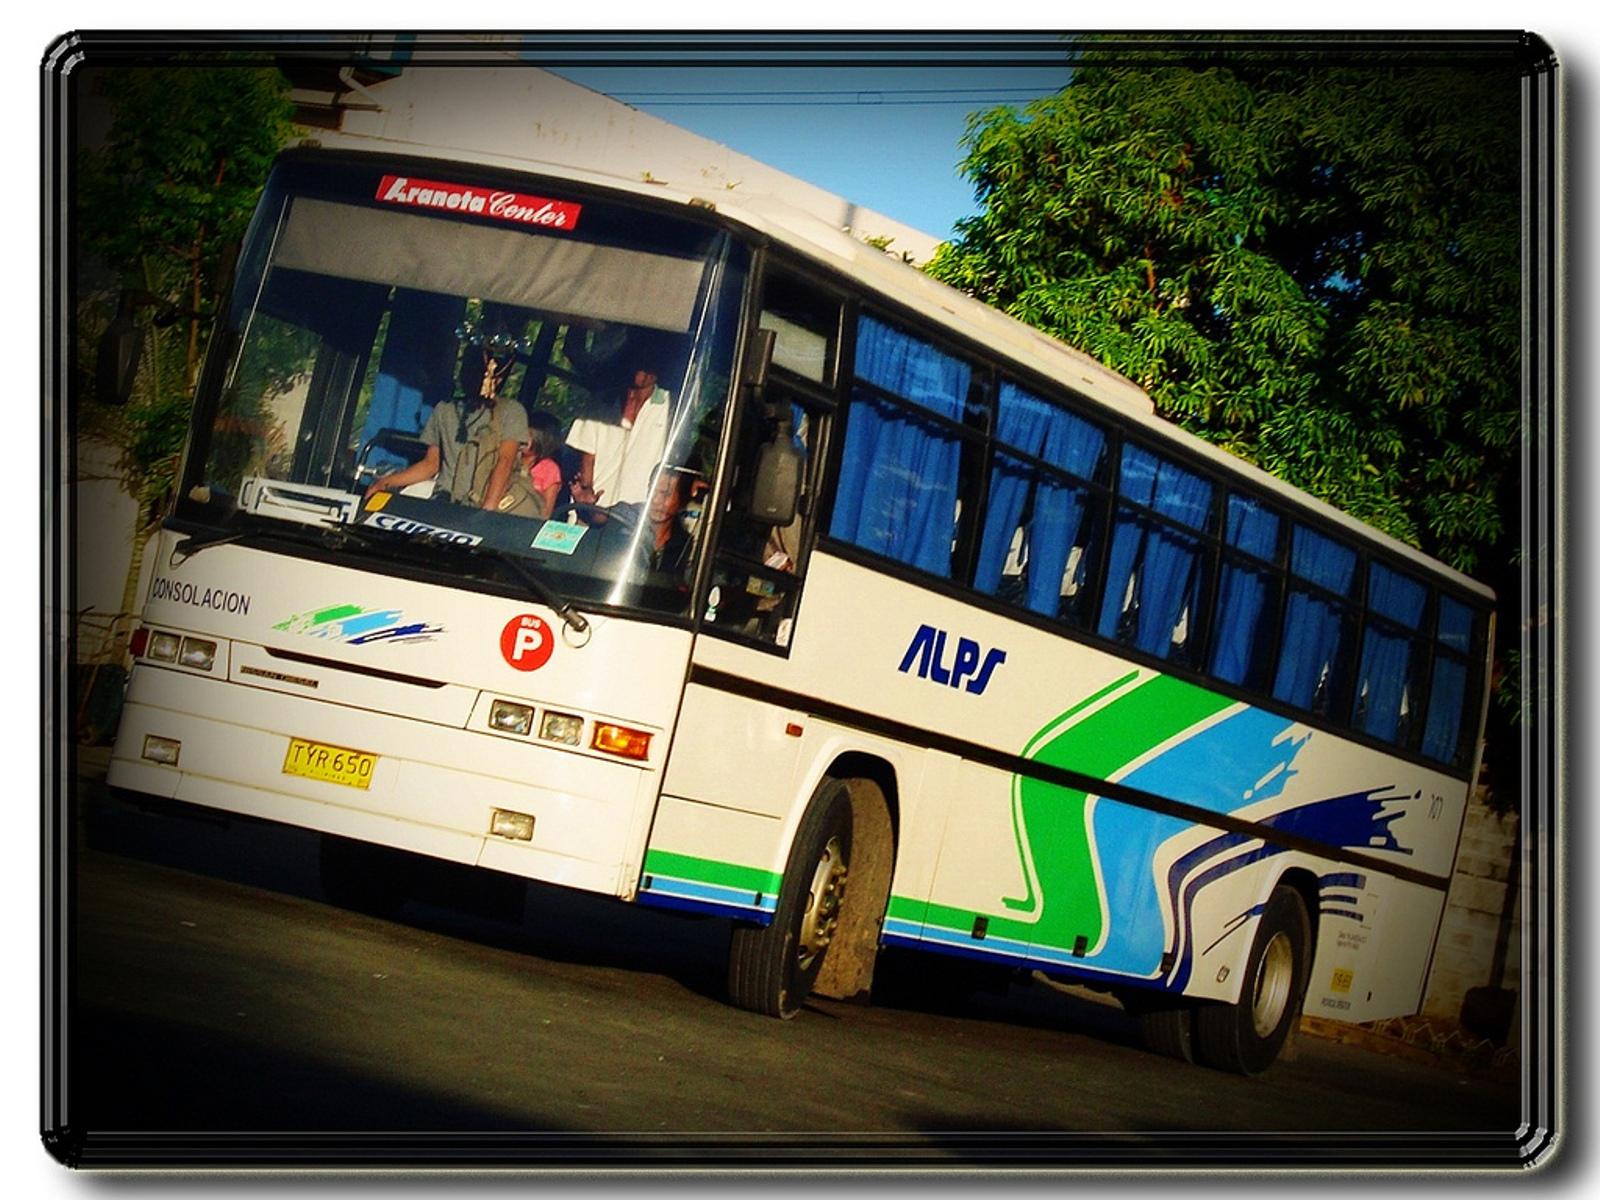 File:ALPS The Bus, Inc. - Nissan Diesel SR Euro - 707 a.k.a.